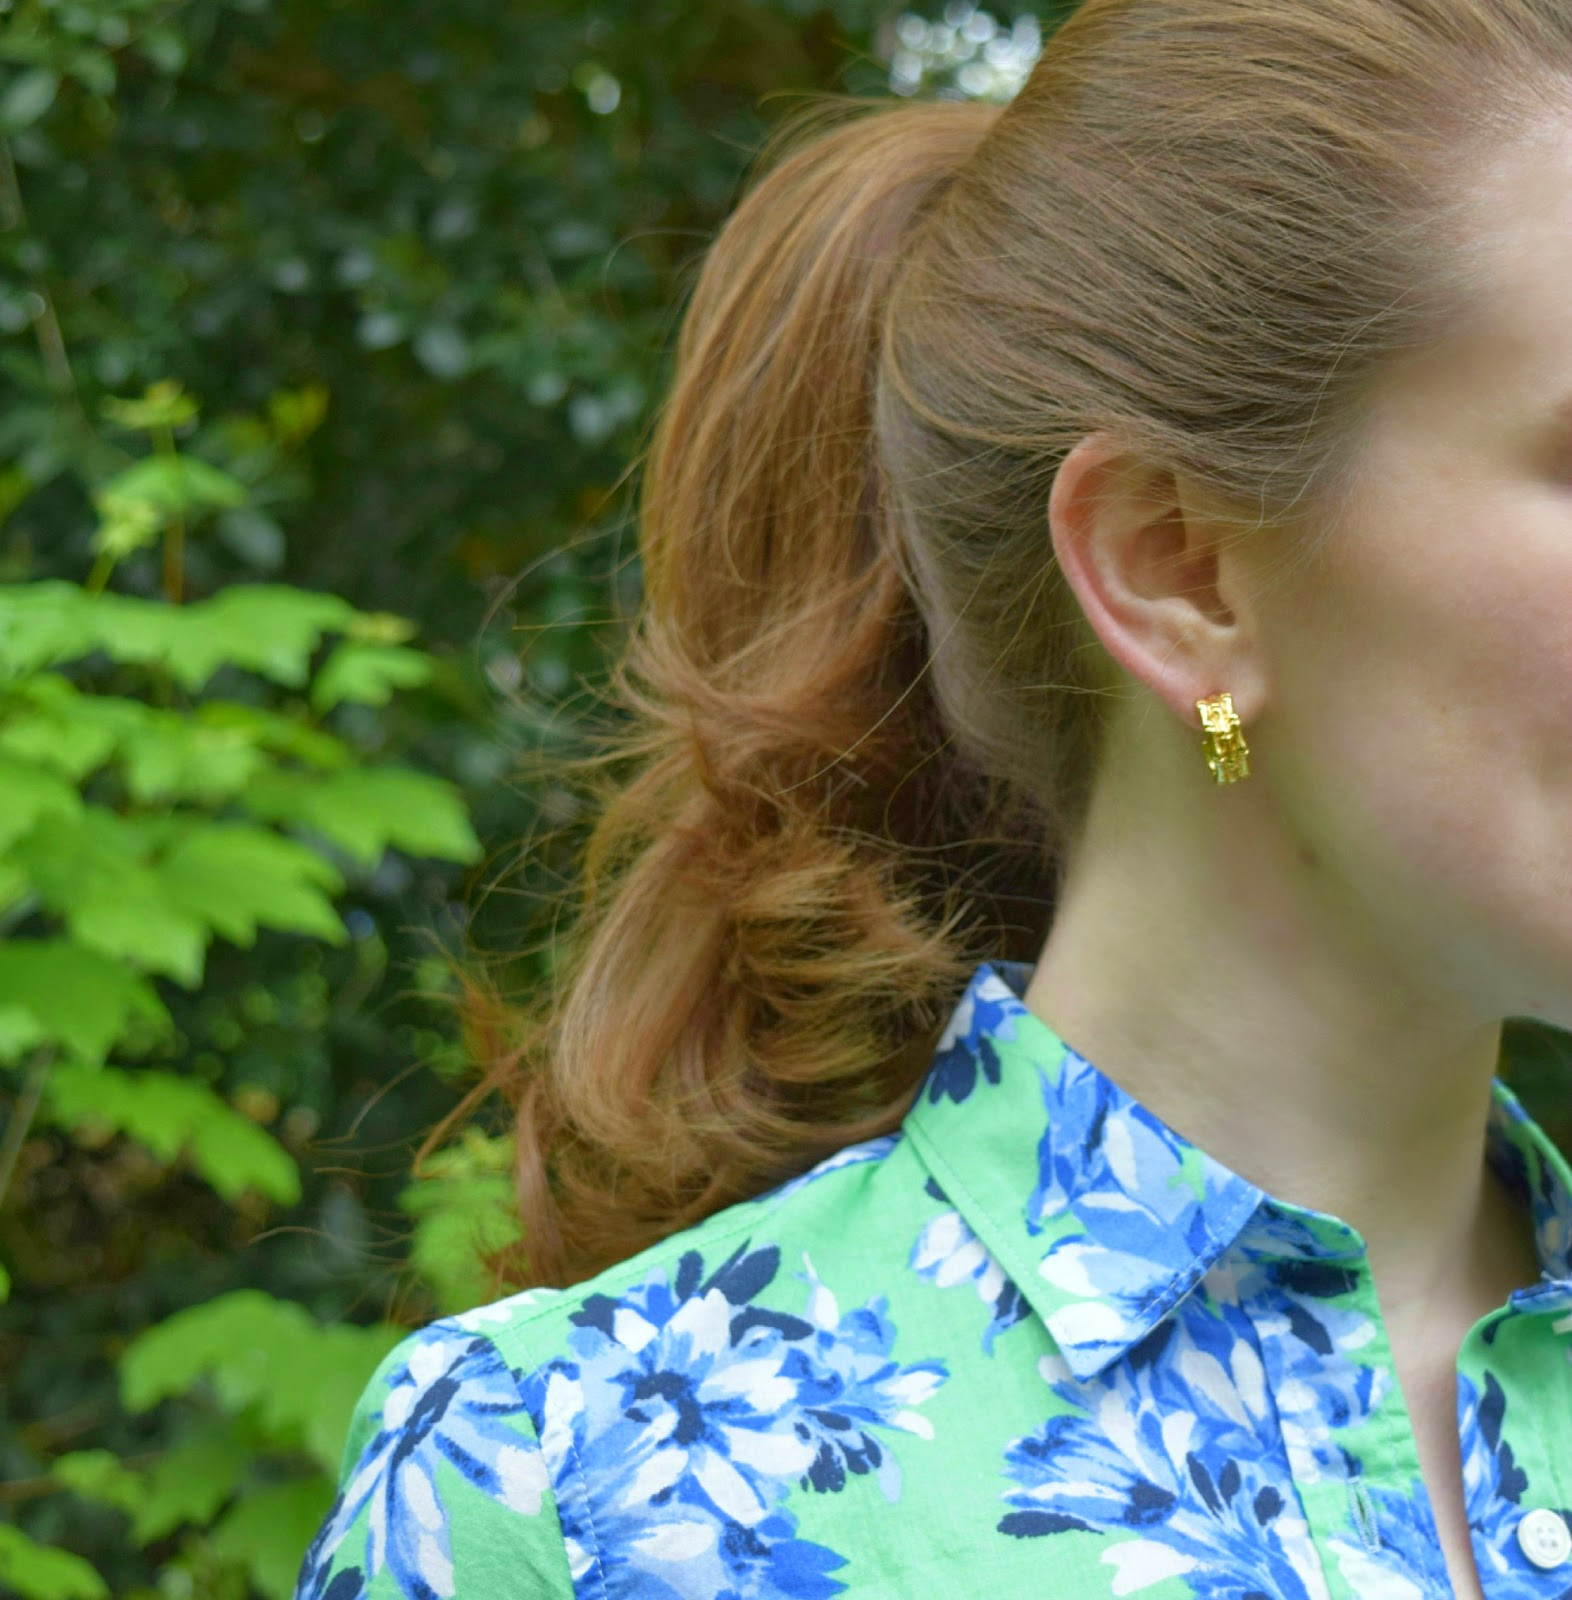 j.crew floral shirt - green floral shirt - j.crew factory floral shirt